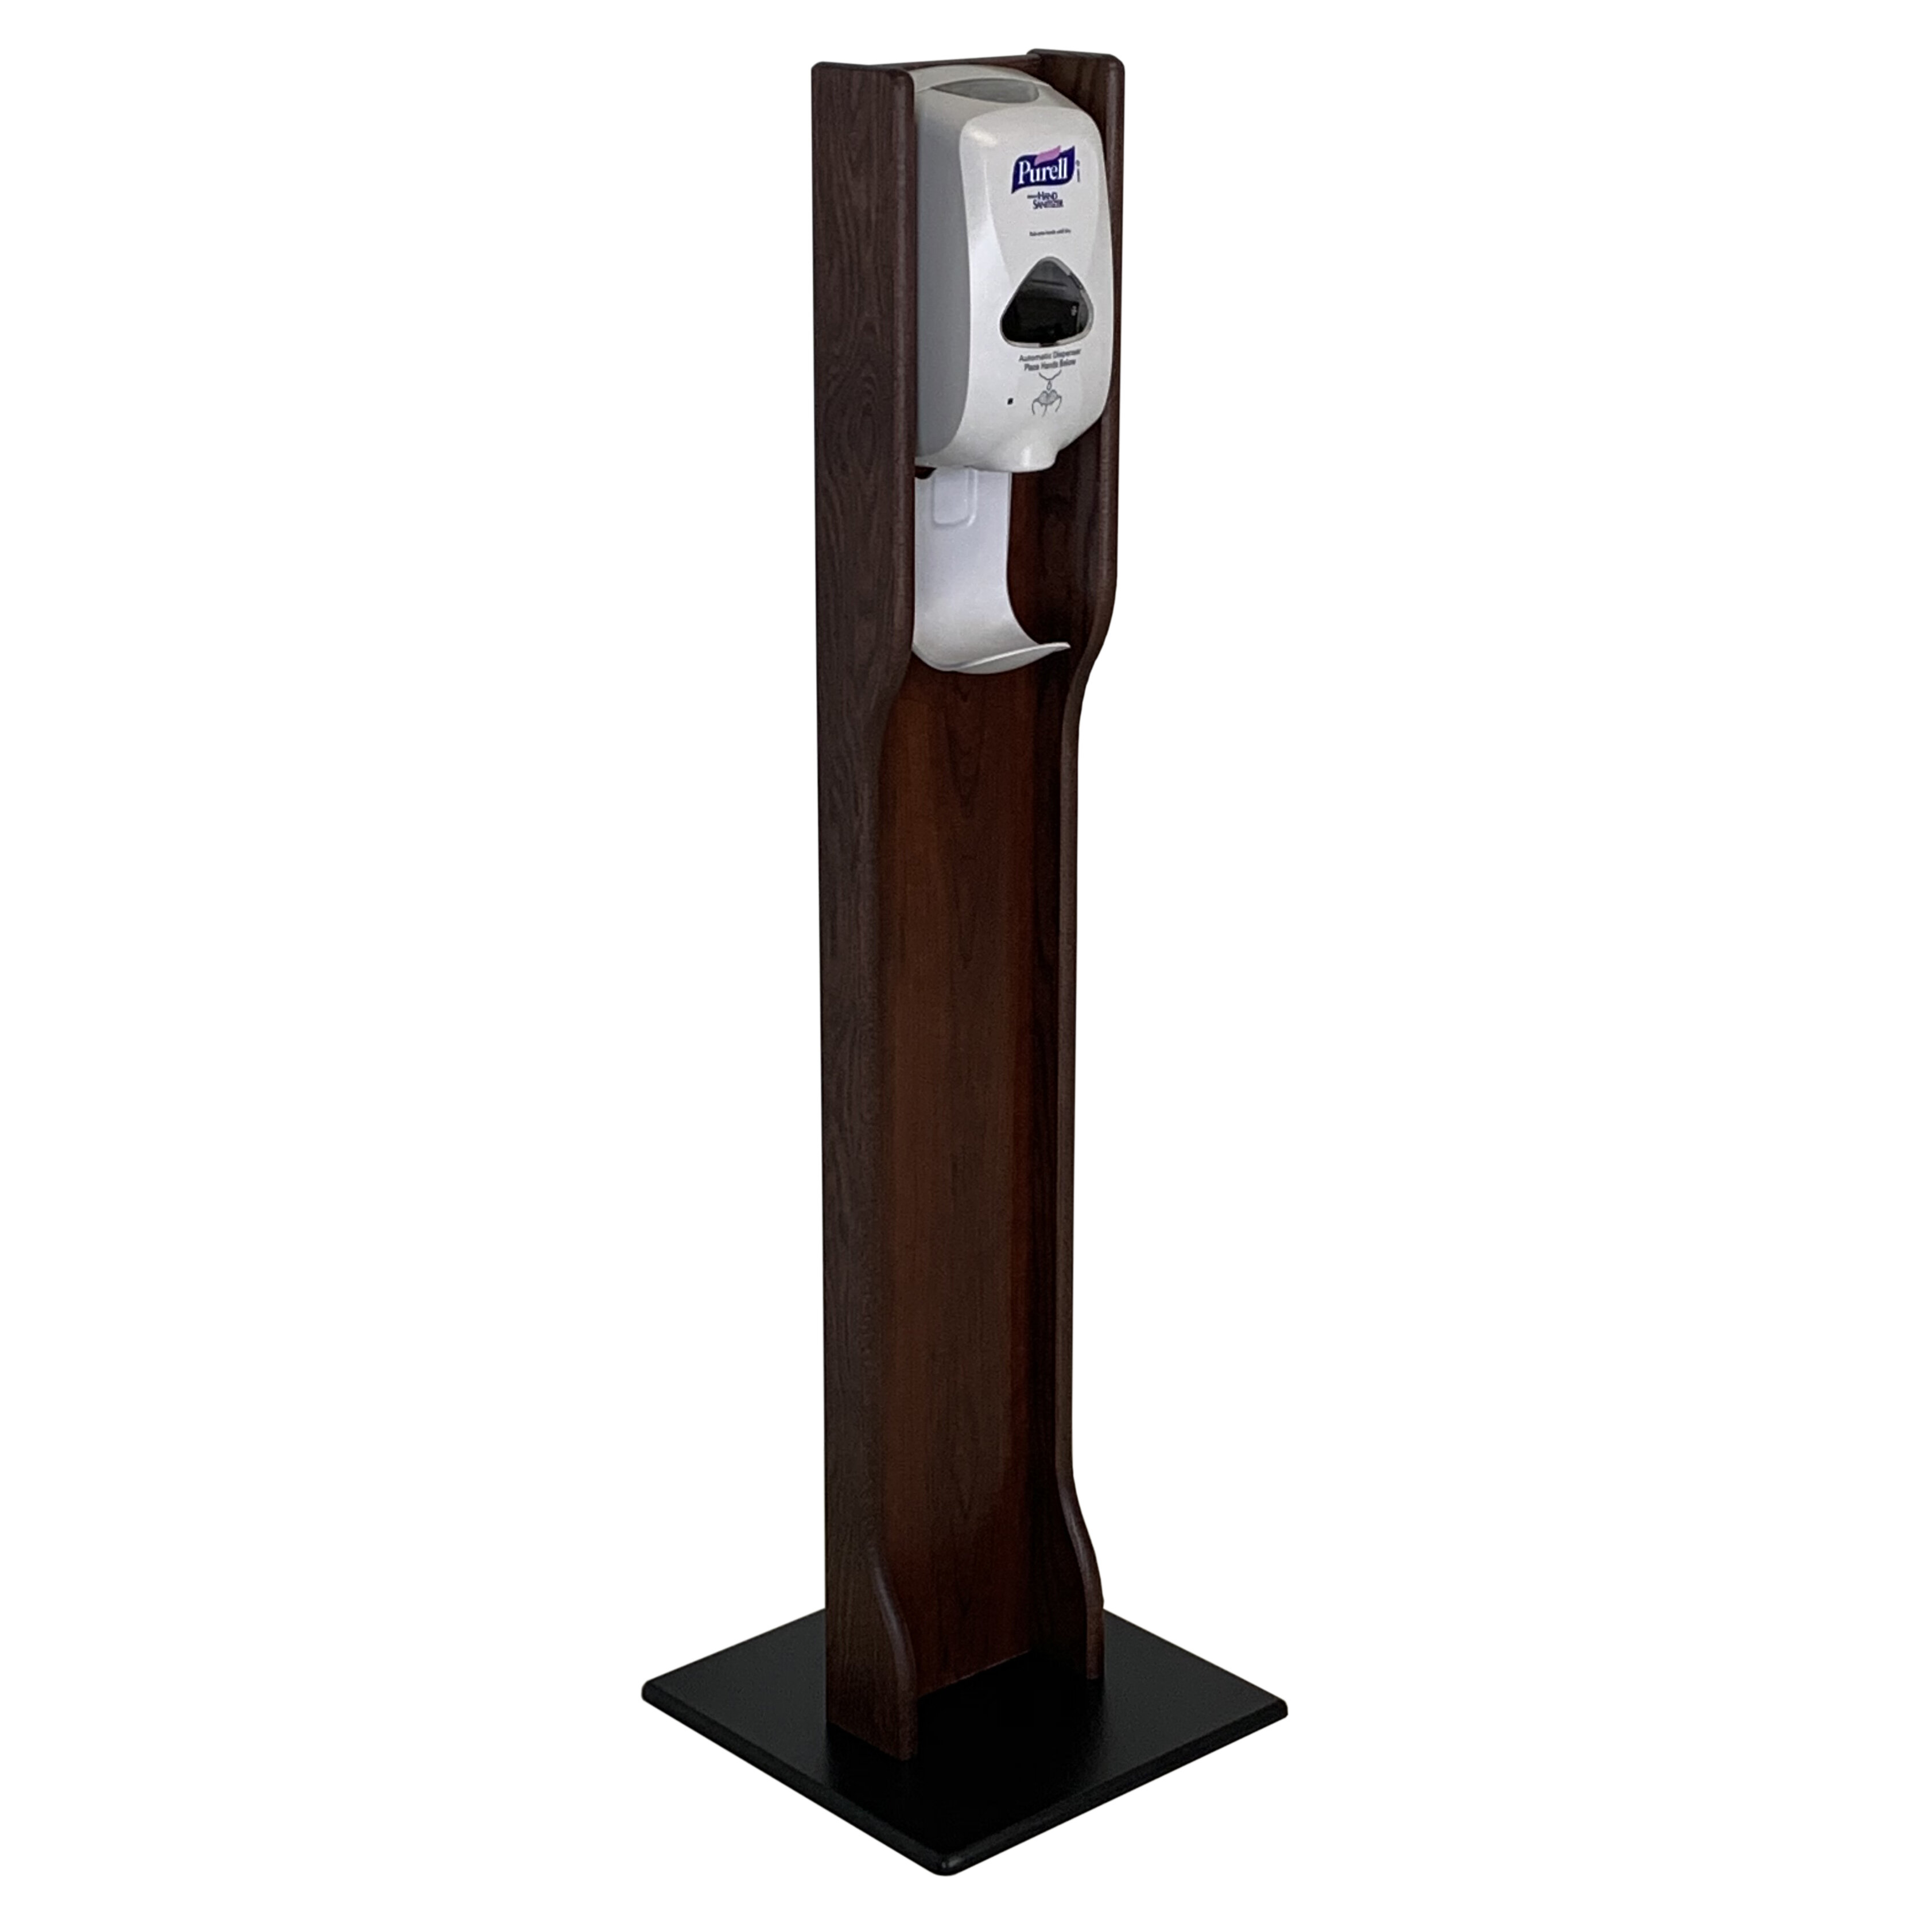 Wooden Mallet Hand Sanitizer Dispenser Stand Elegant Design In Mahogany Wayfair